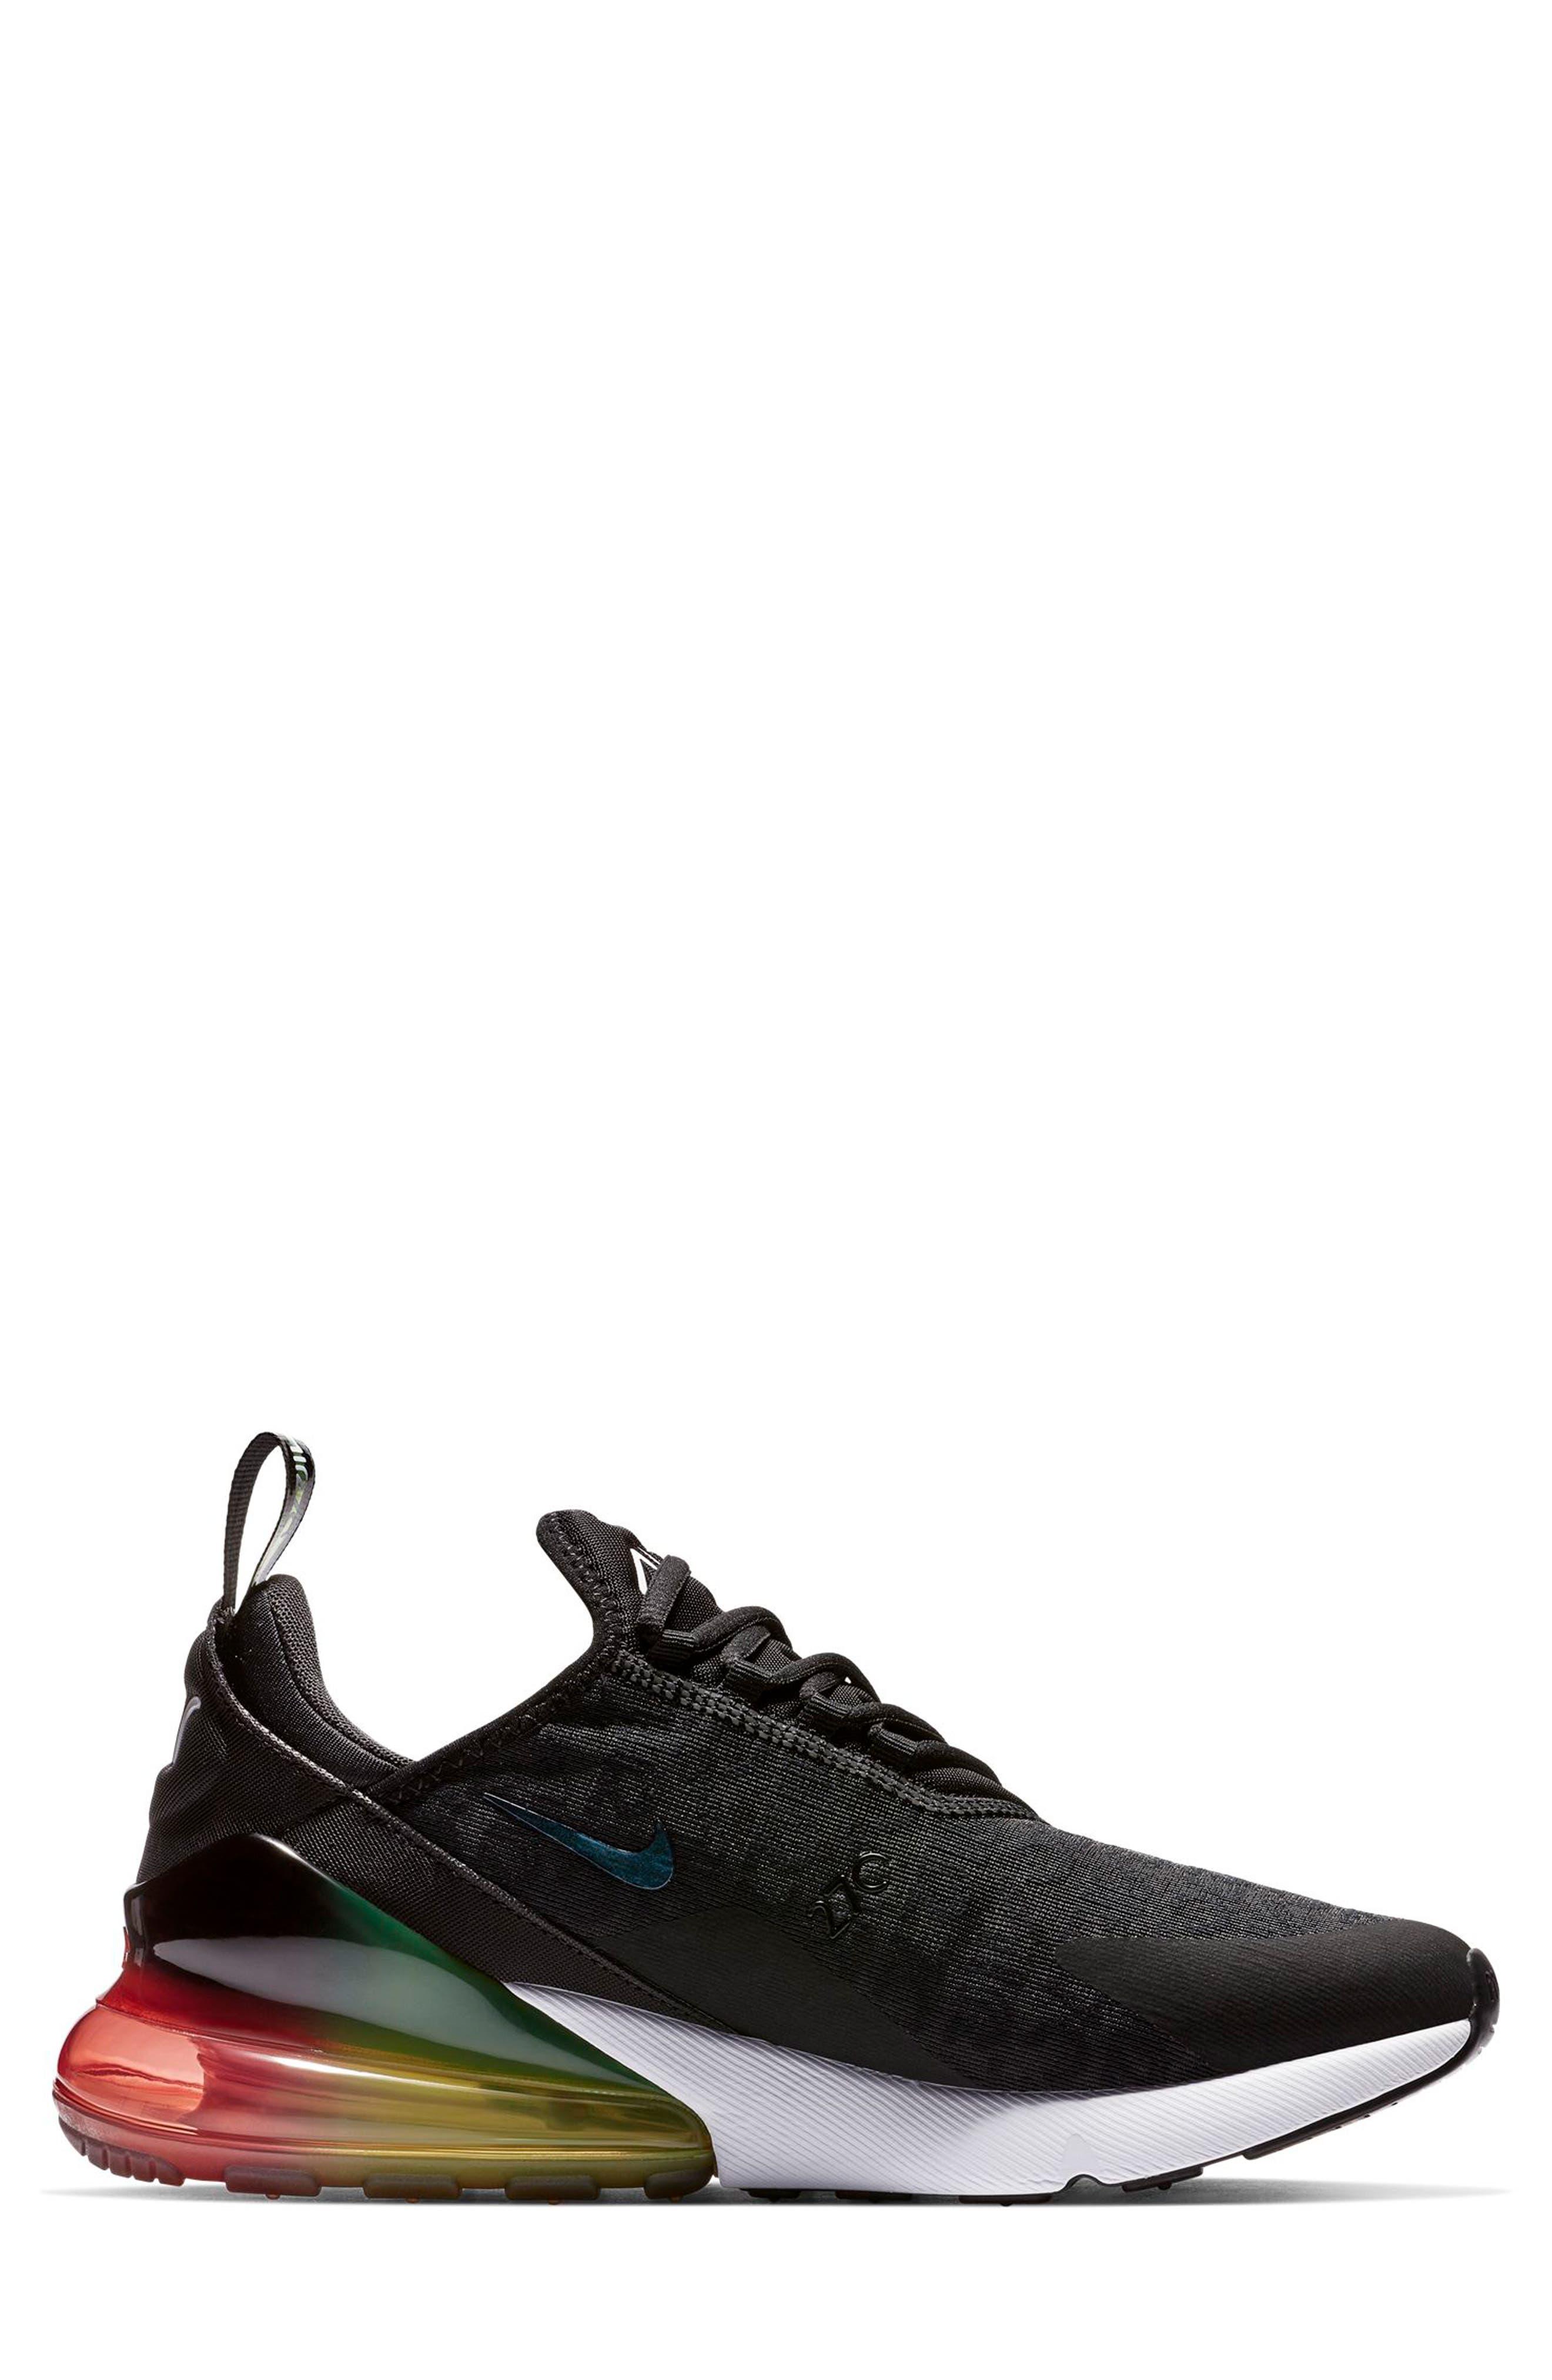 NIKE,                             Air Max 270 SE Sneaker,                             Alternate thumbnail 3, color,                             BLACK/ ORANGE/ EMBER GLOW